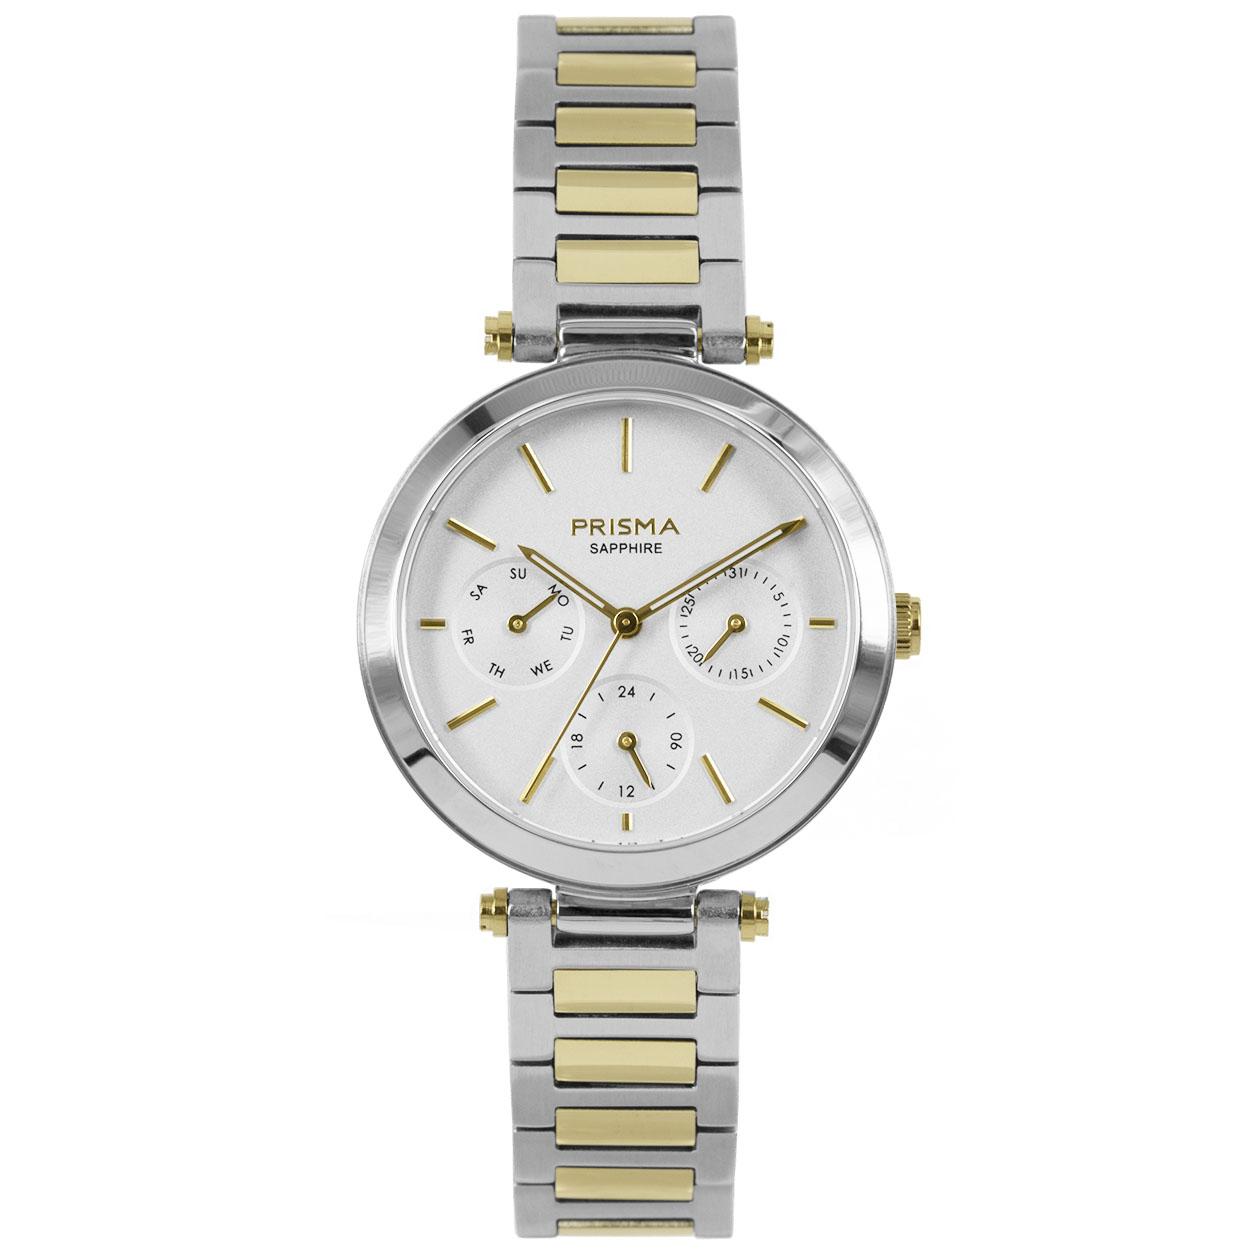 Prisma P.1342 Horloge Multifunctioneel staal zilver- en goudkleurig 32 mm